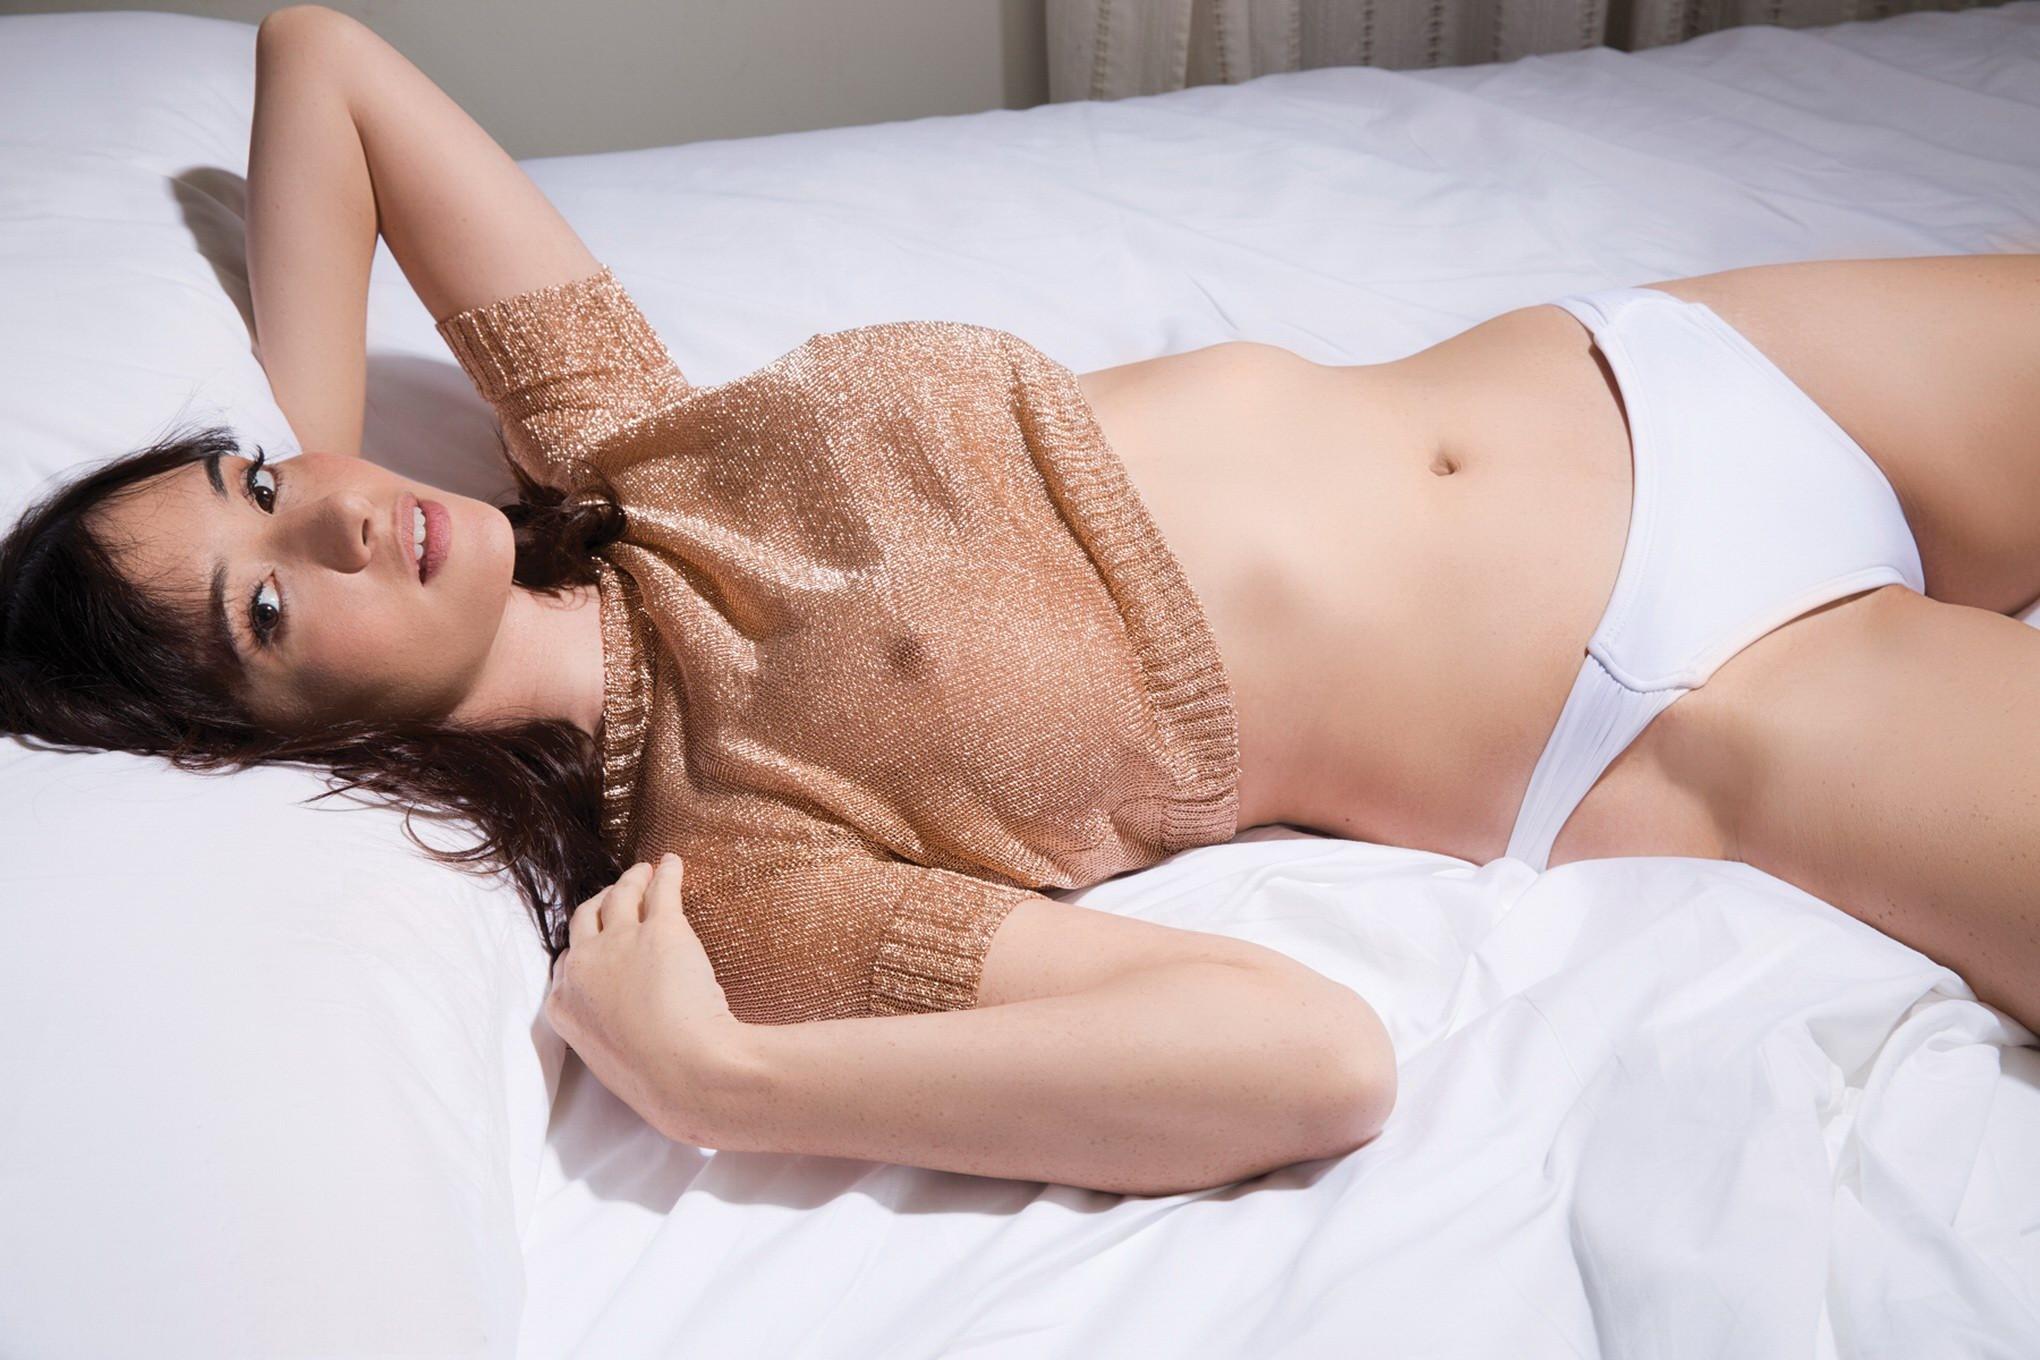 Barbara crampton nude boobs and sex in reanimator movie 10